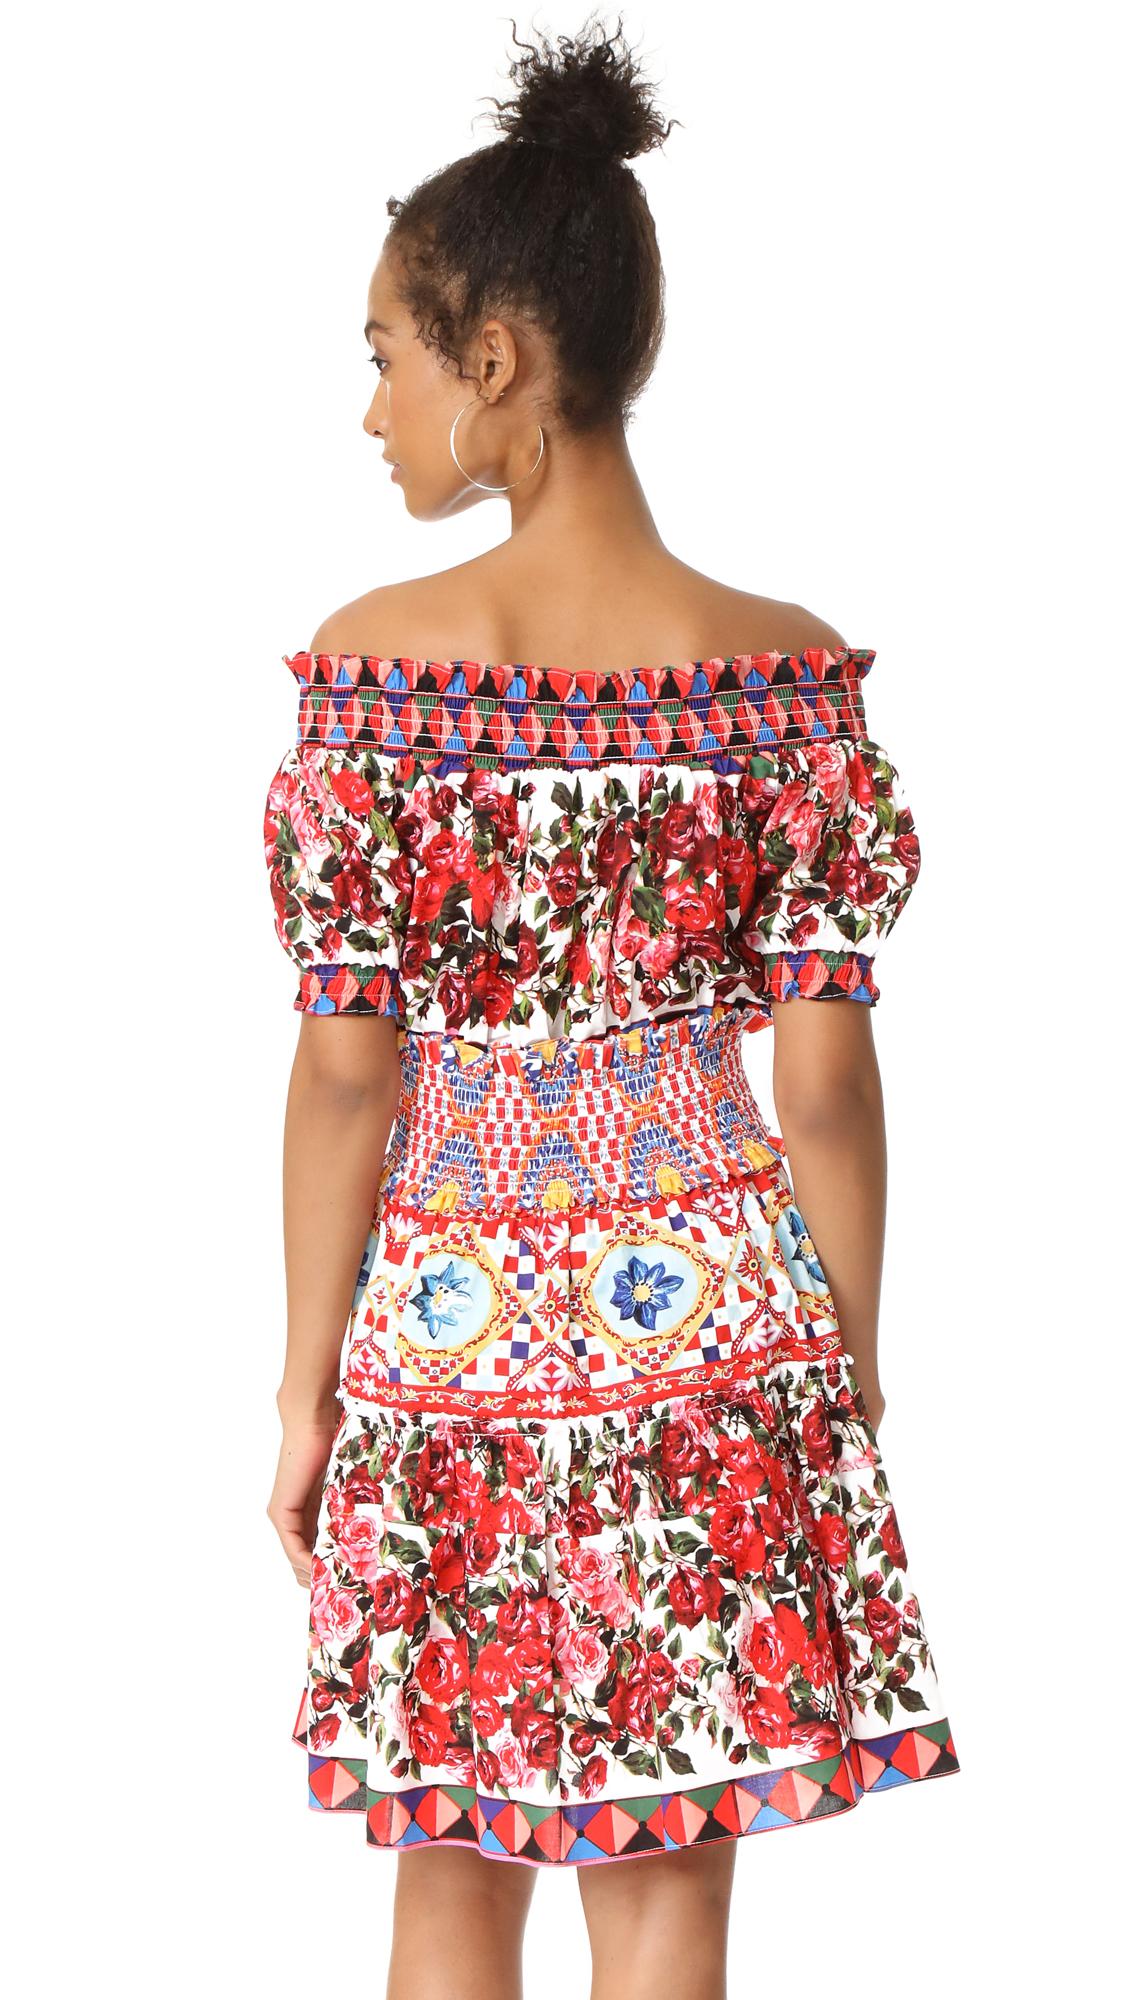 8d6319683ee0 STYLEKEEPERS Wild Flowers Off Shoulder Dress